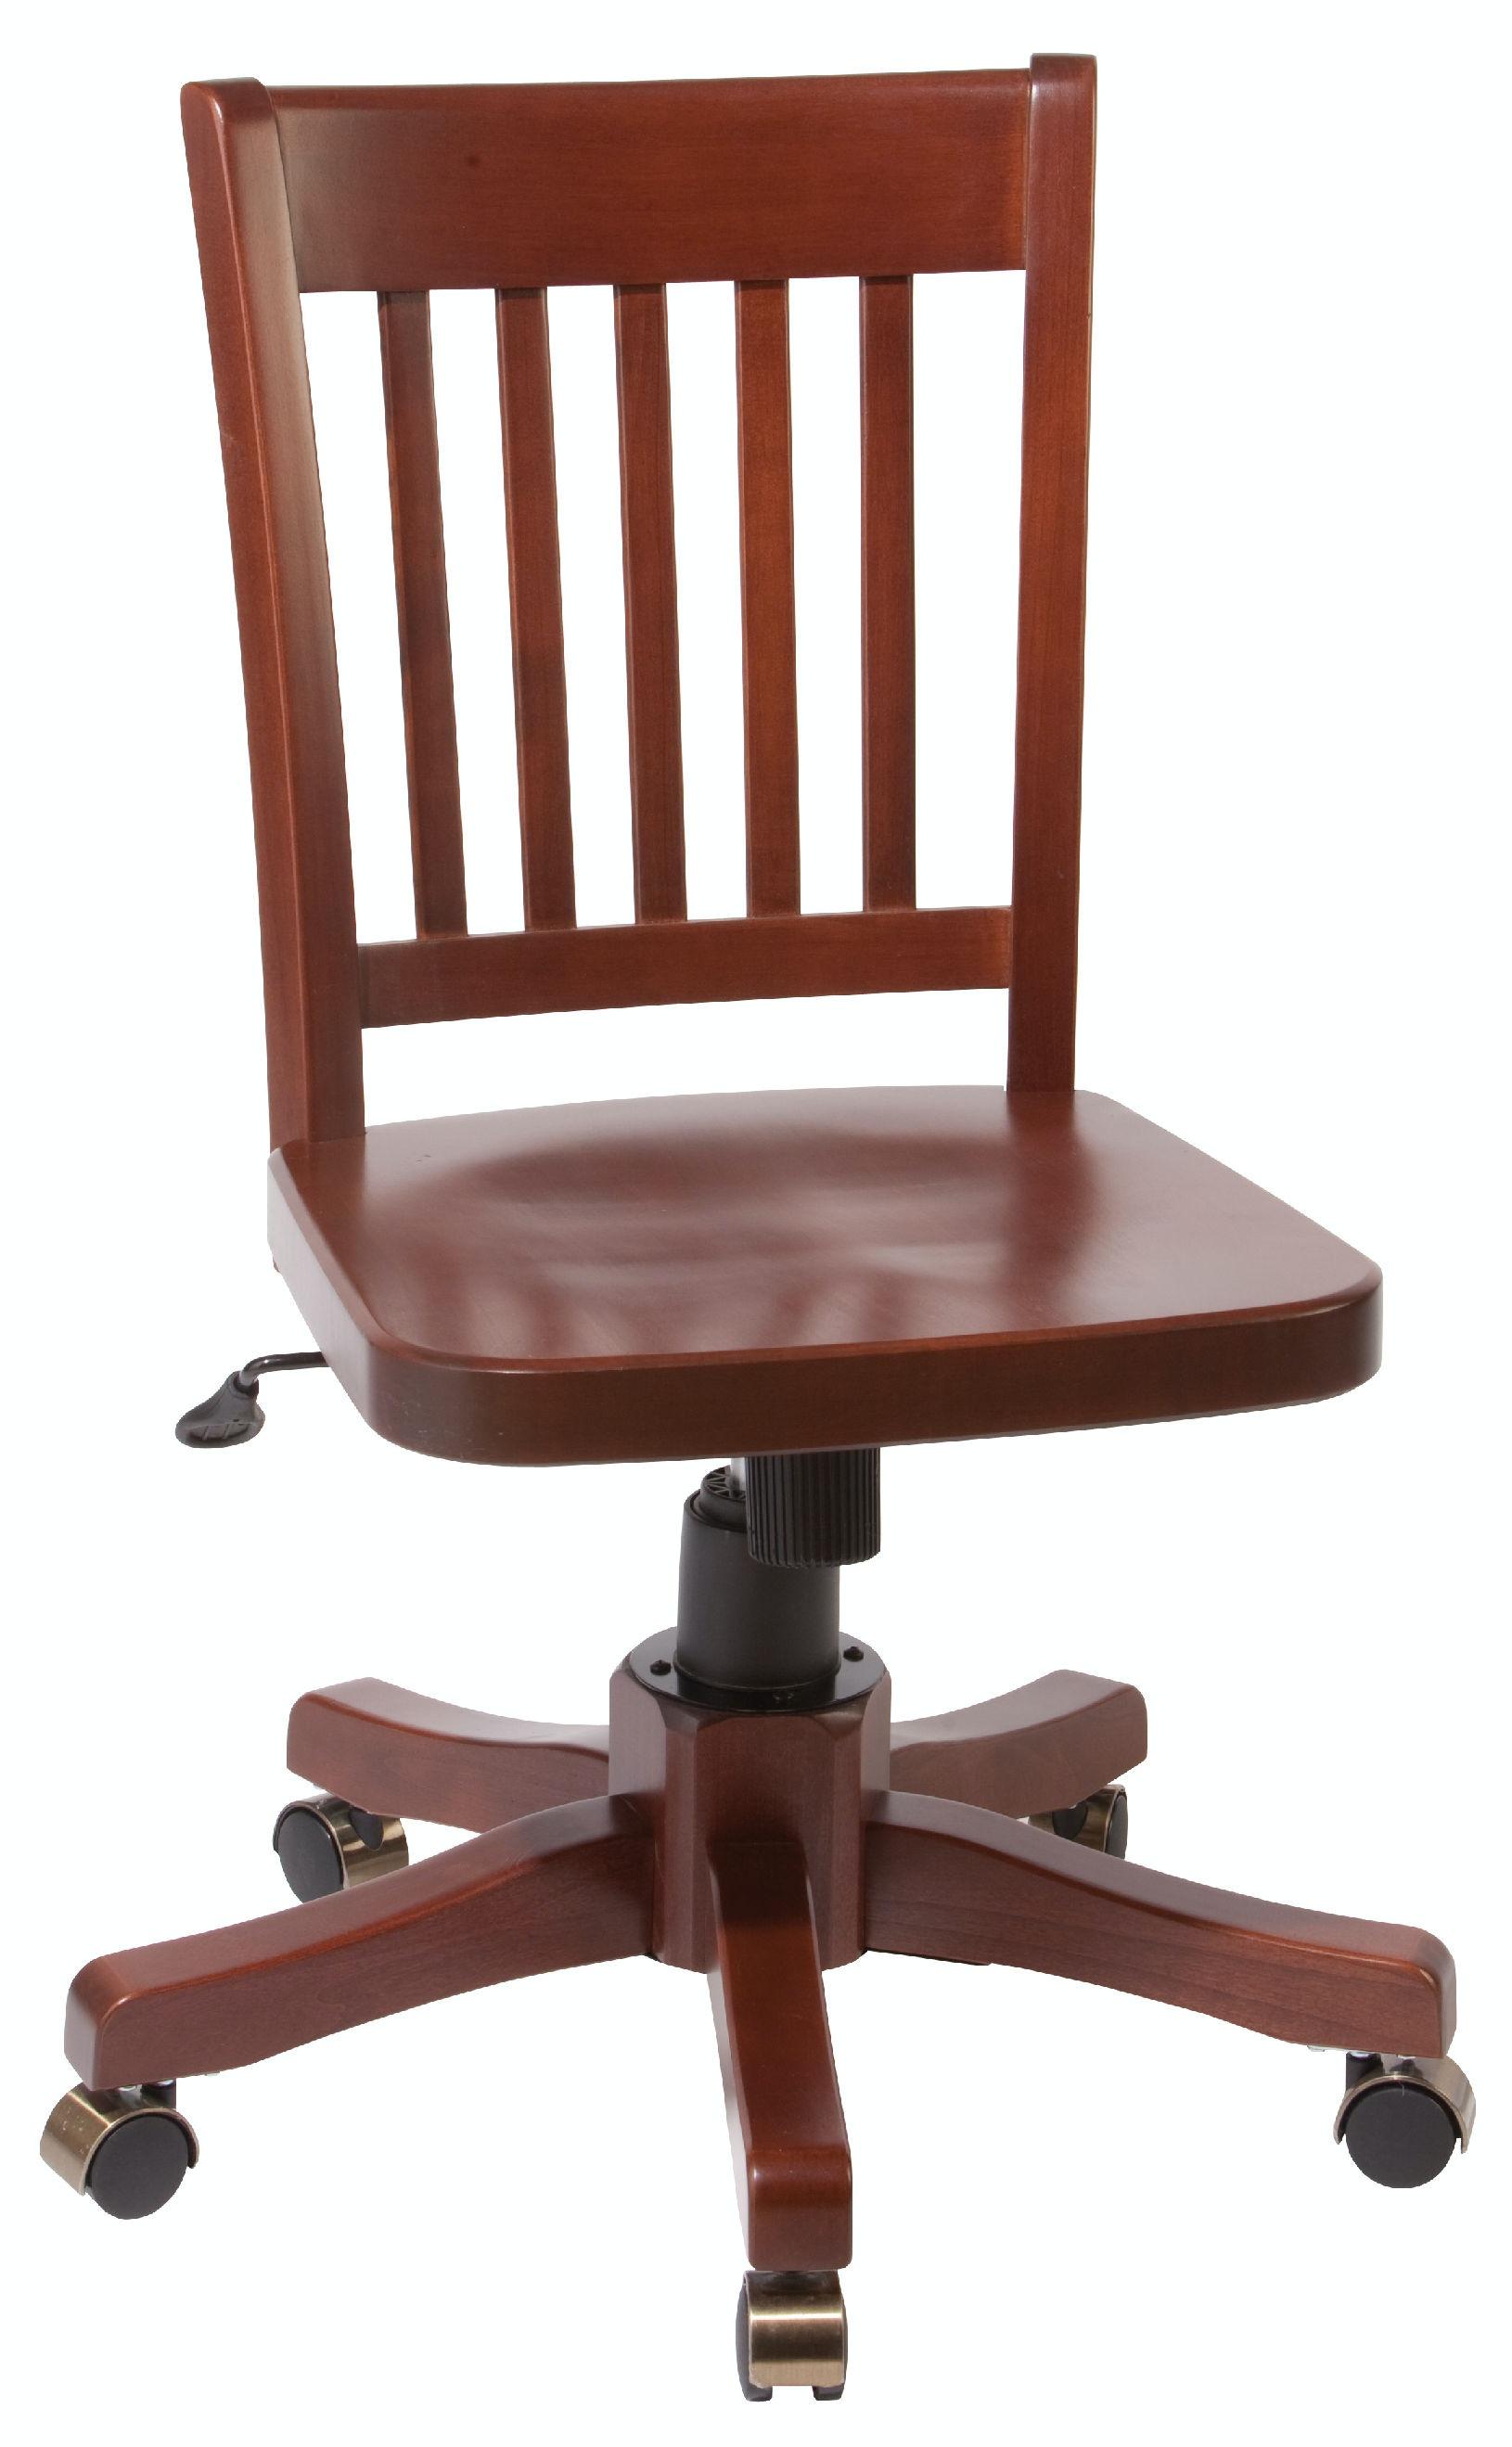 Whittier Wood Furniture Portland Or Key Home Furnishings